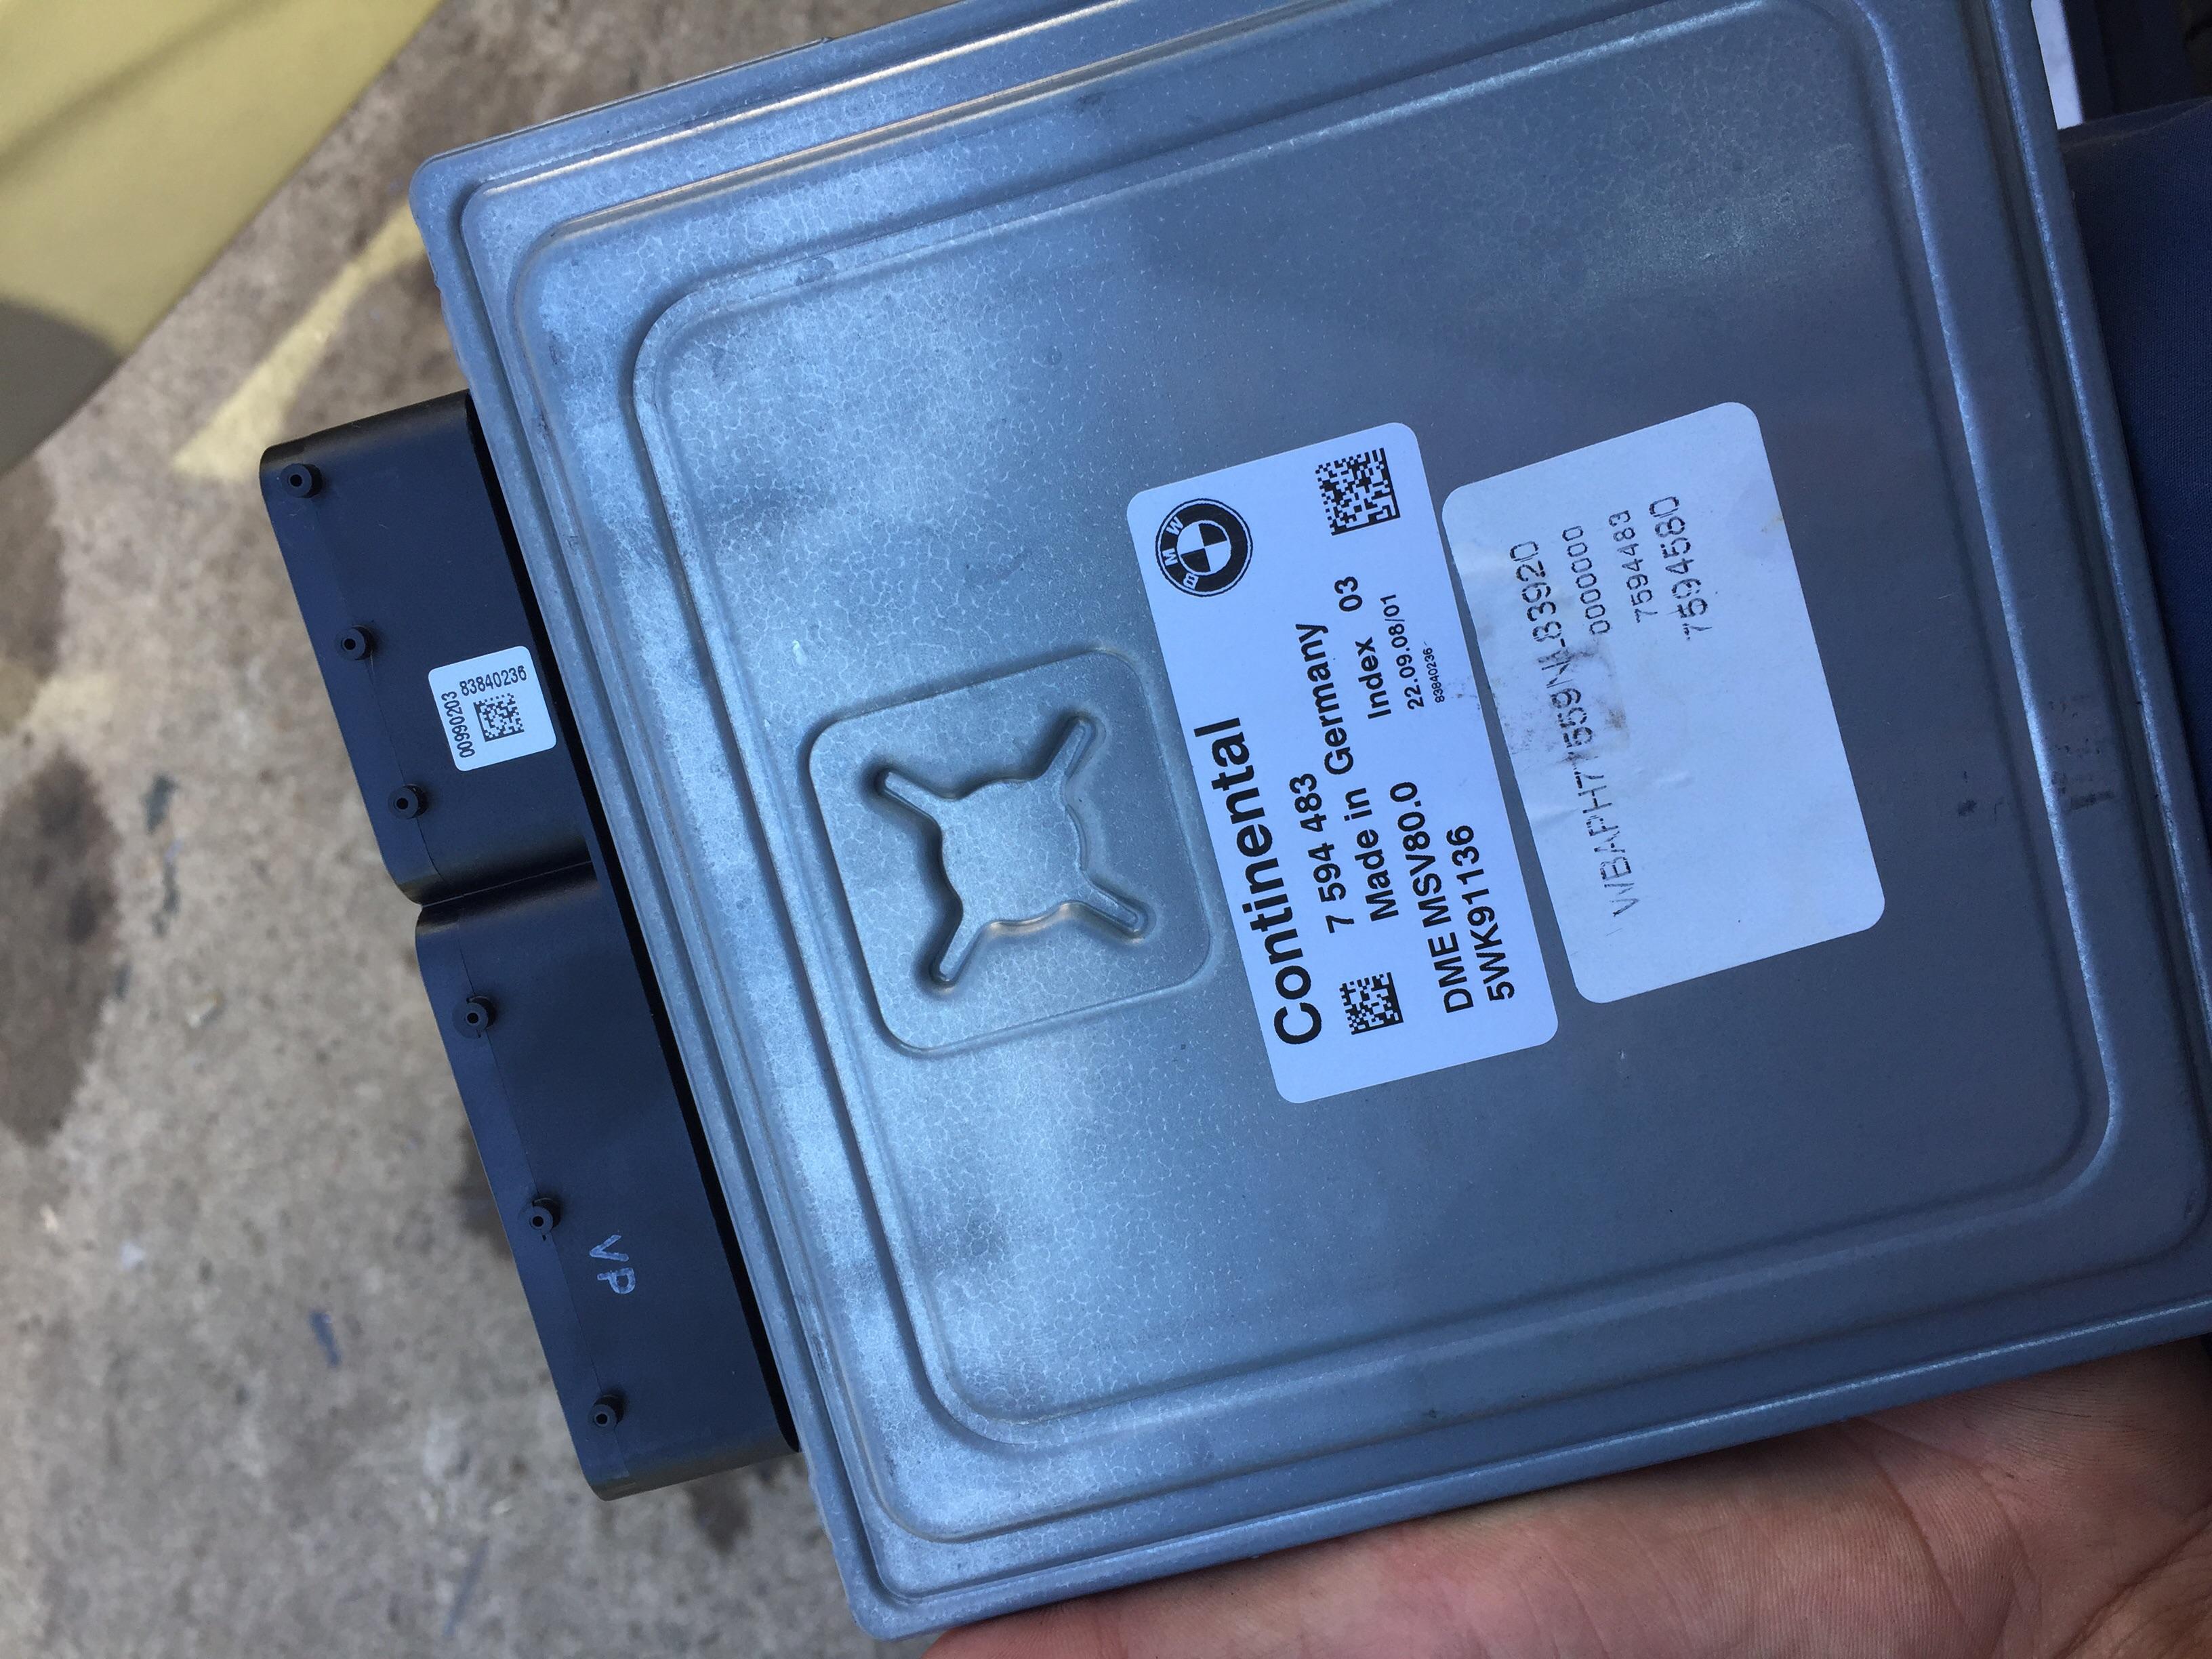 E90 Fuel Pump Plausibility